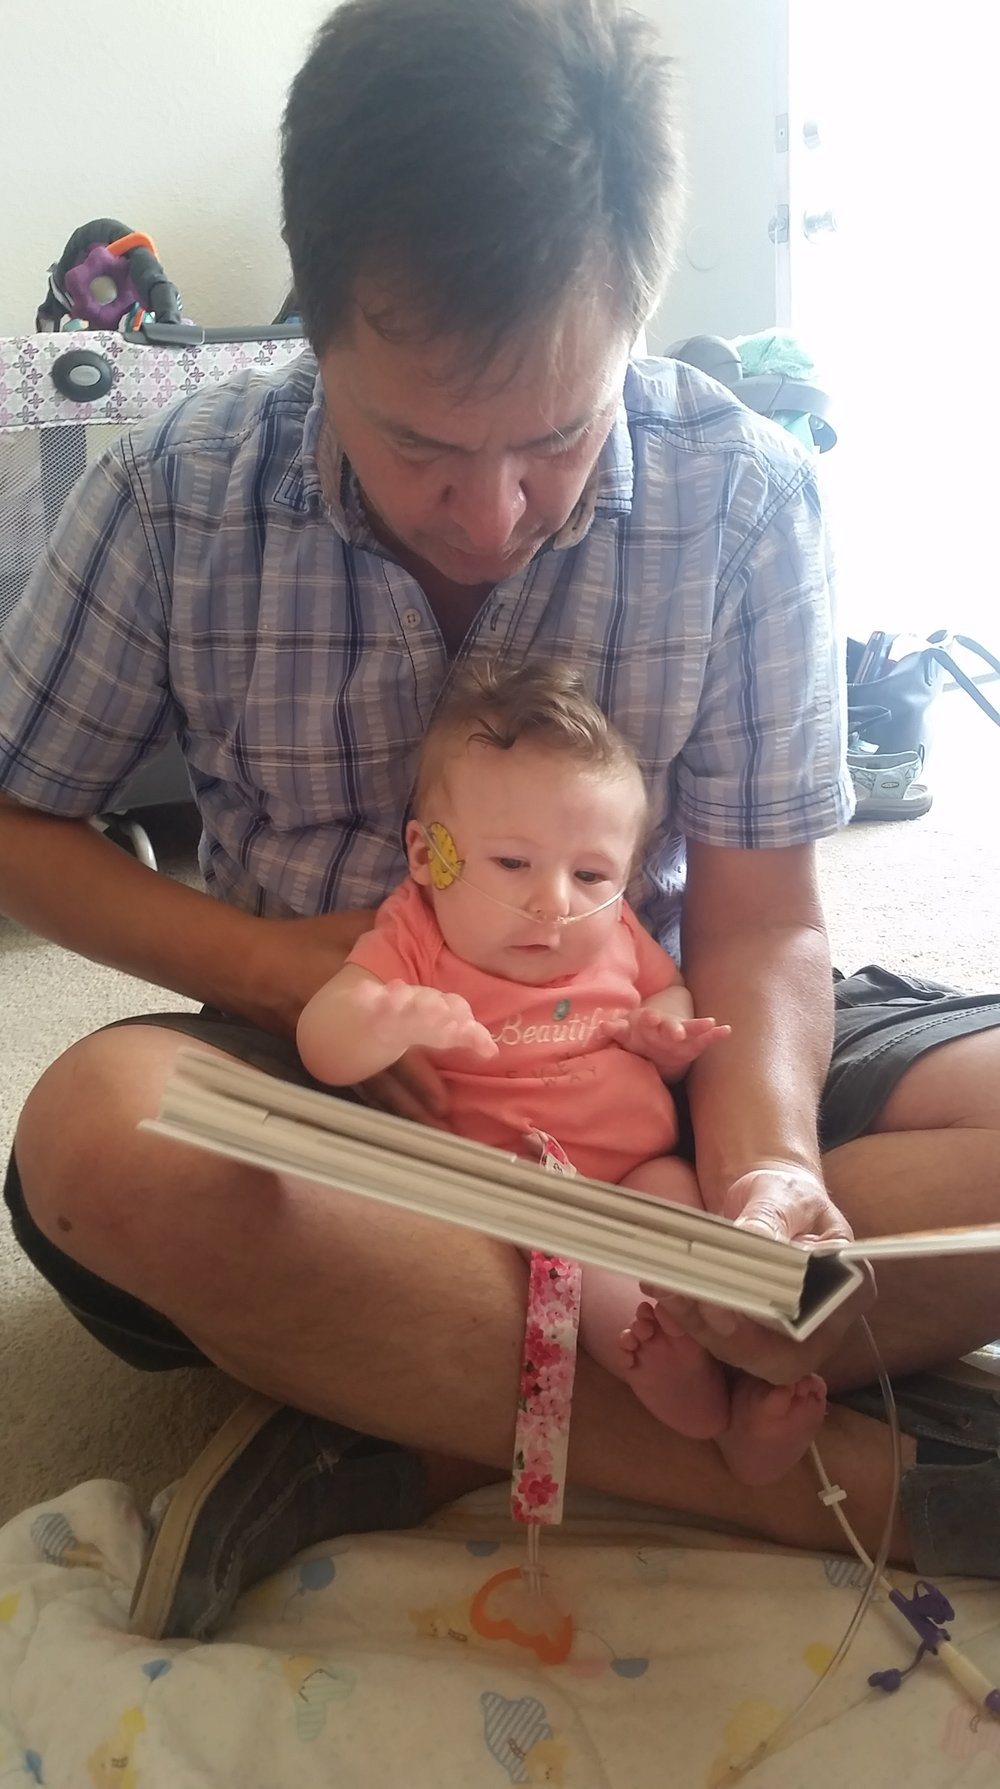 Eevee helps Jon read a book